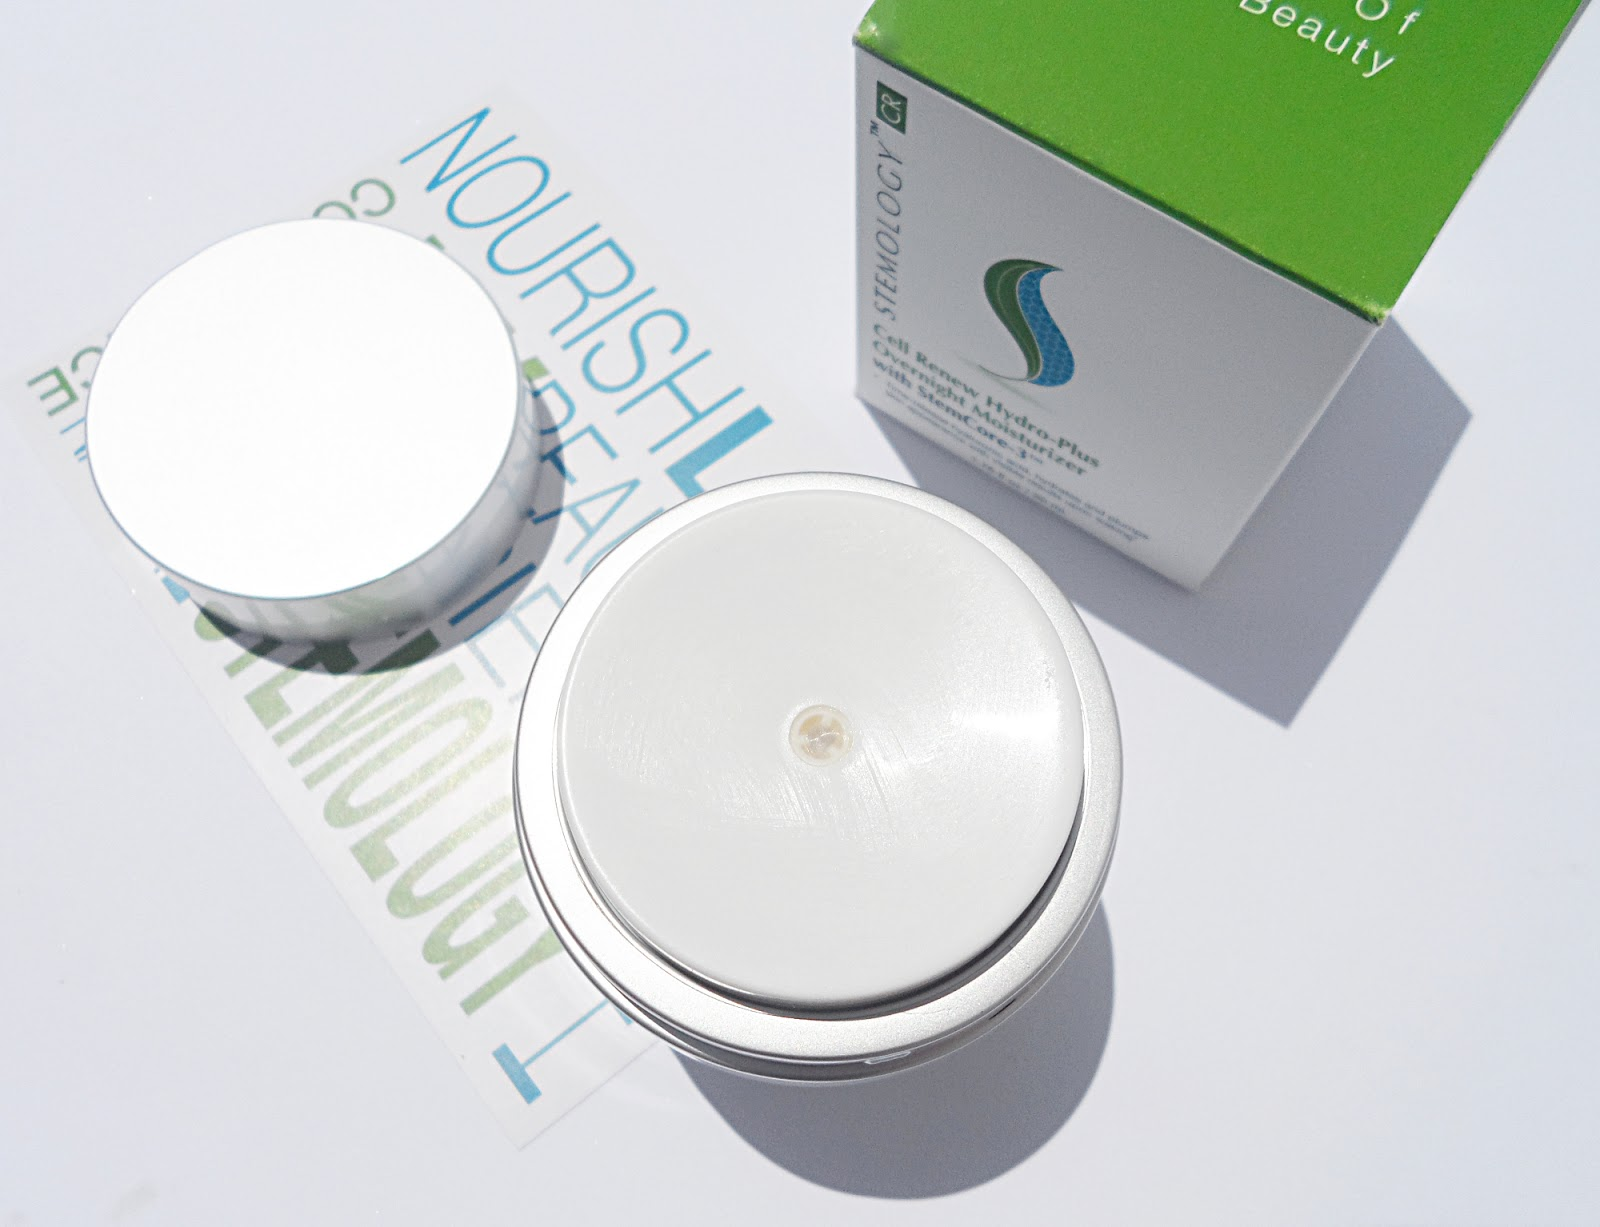 Stemology Cell Renew Hydro - Plus Overnight Moisturizer stemology skin care products review blogger liz breygel anti aging face cream gel